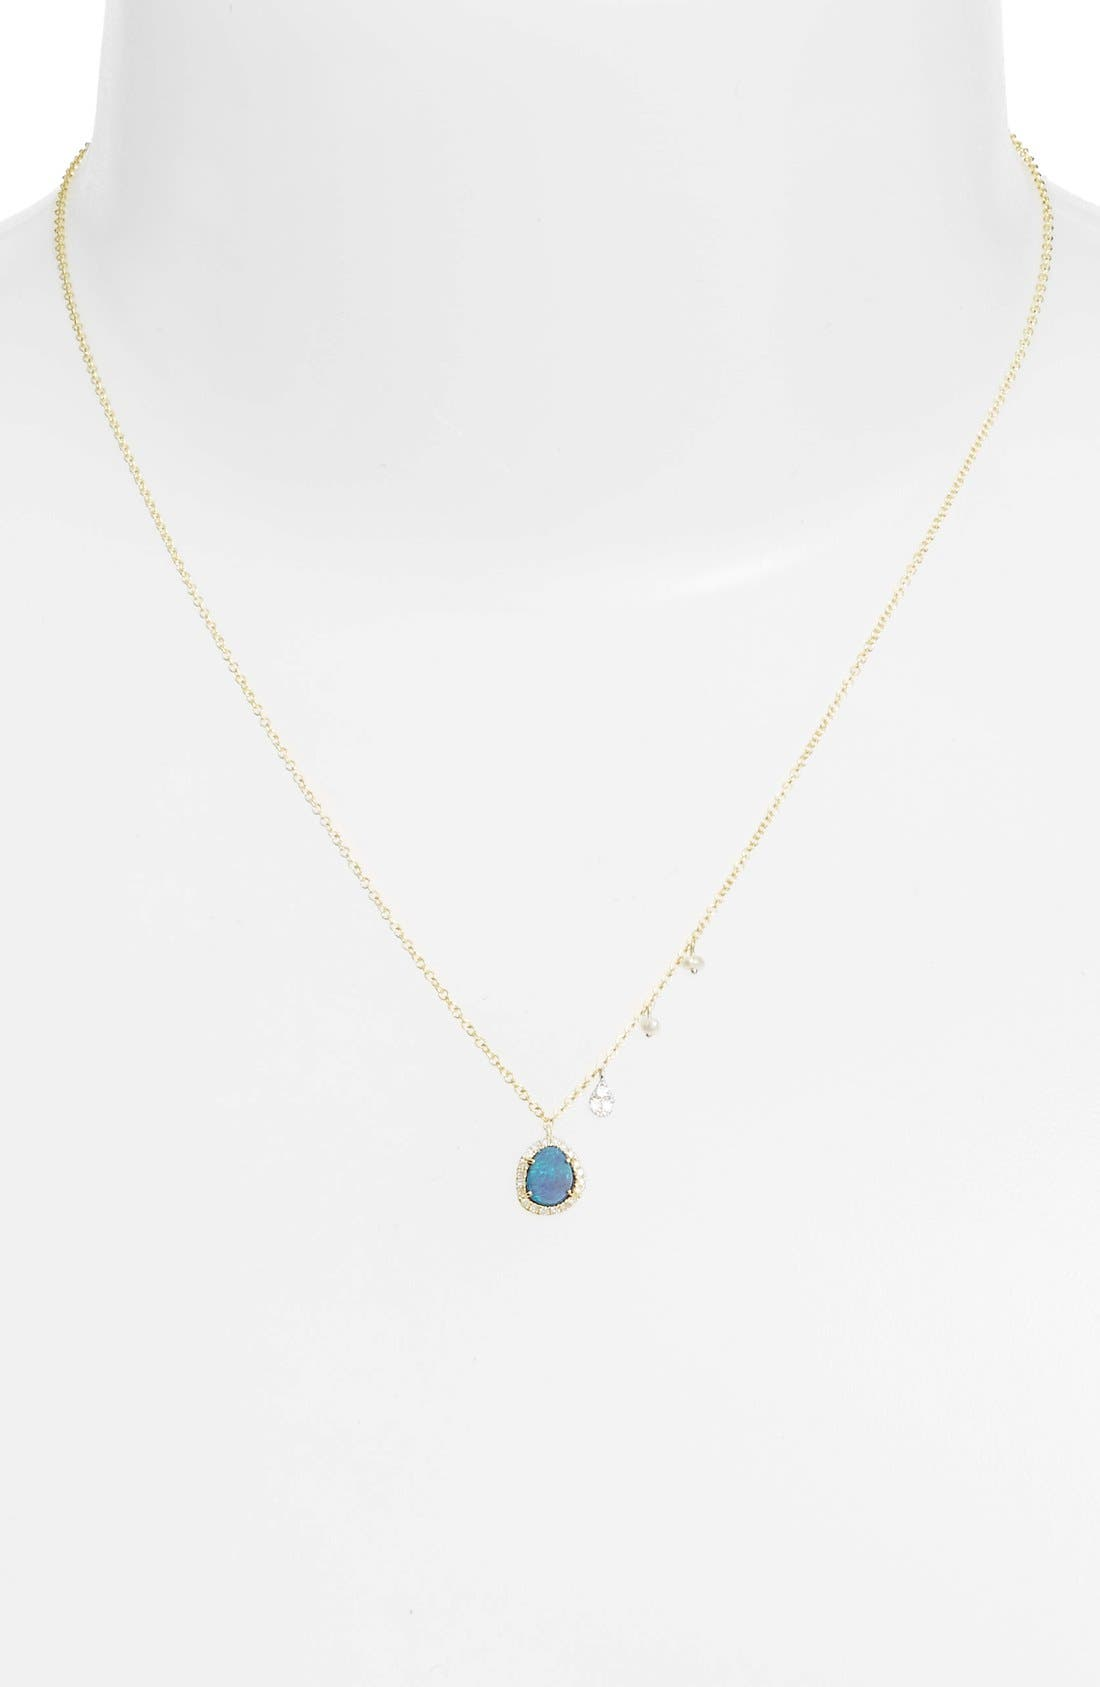 Mini Stone Diamond Pendant Necklace,                             Alternate thumbnail 4, color,                             YELLOW GOLD/ OPAL